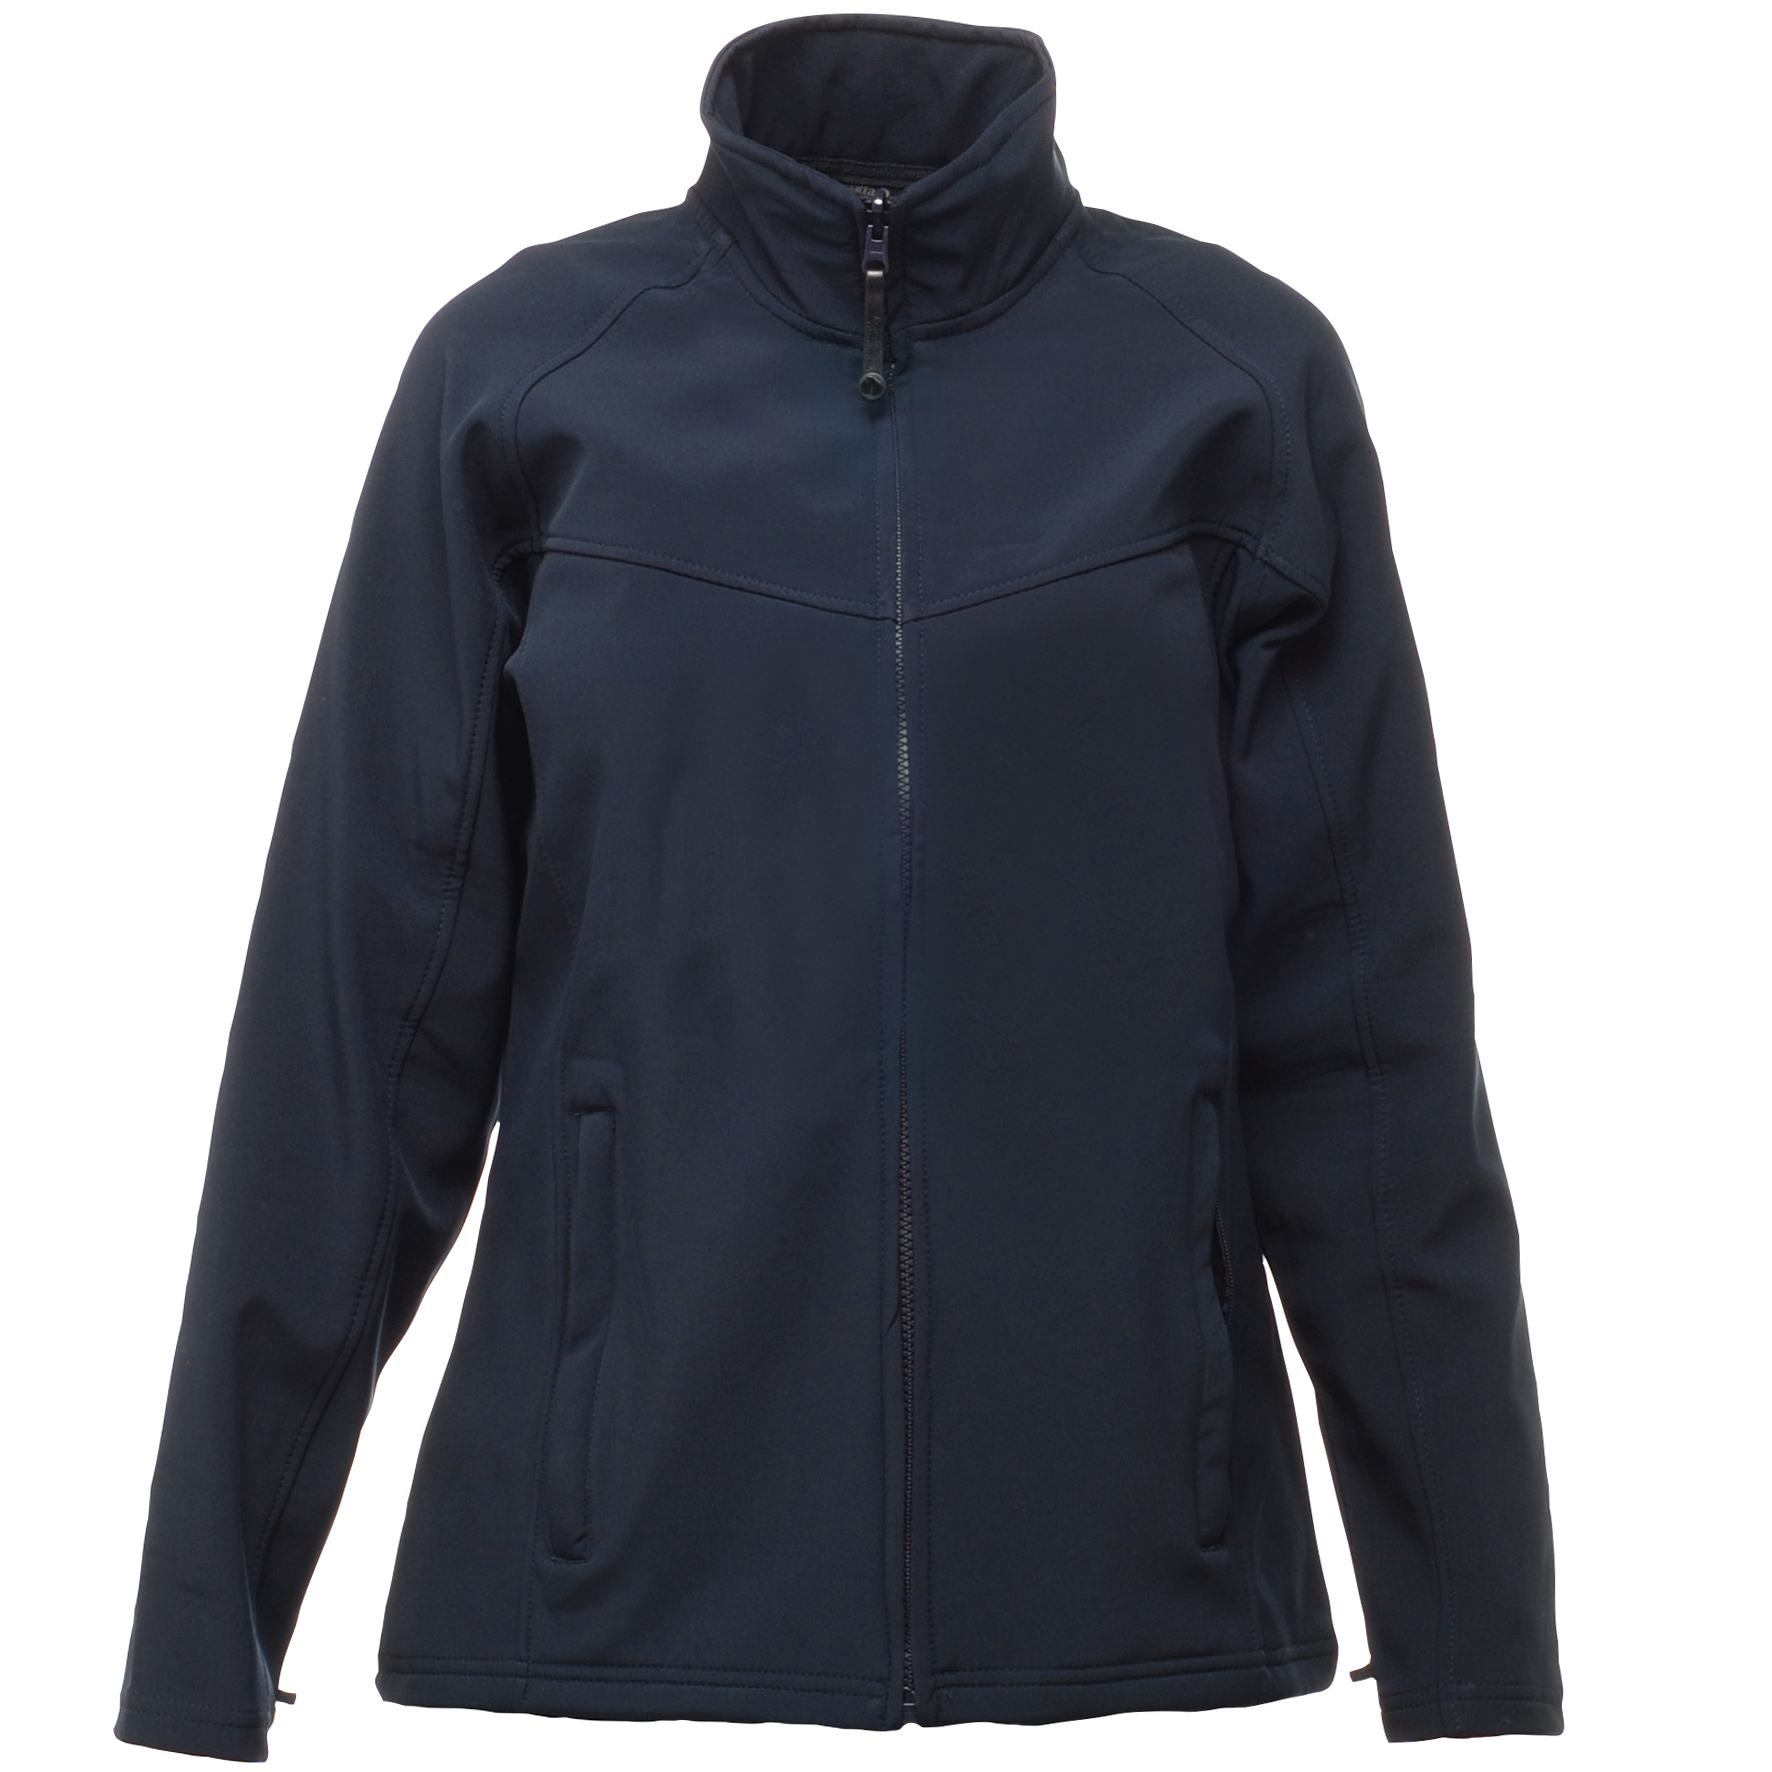 Regatta Womens/Ladies Uproar Softshell Jacket (Water Repellent & Wind Resistant) (12) (Navy/Navy)